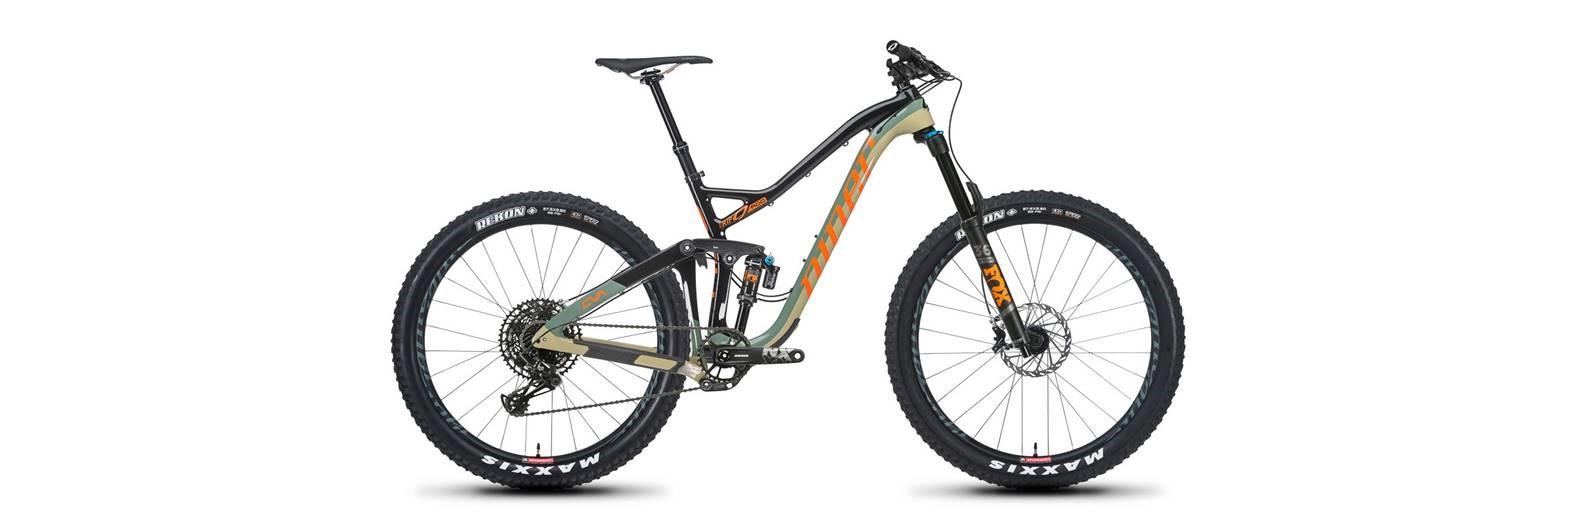 Niner Bikes Rip RDO Model Available at Mt Hood Bicycle